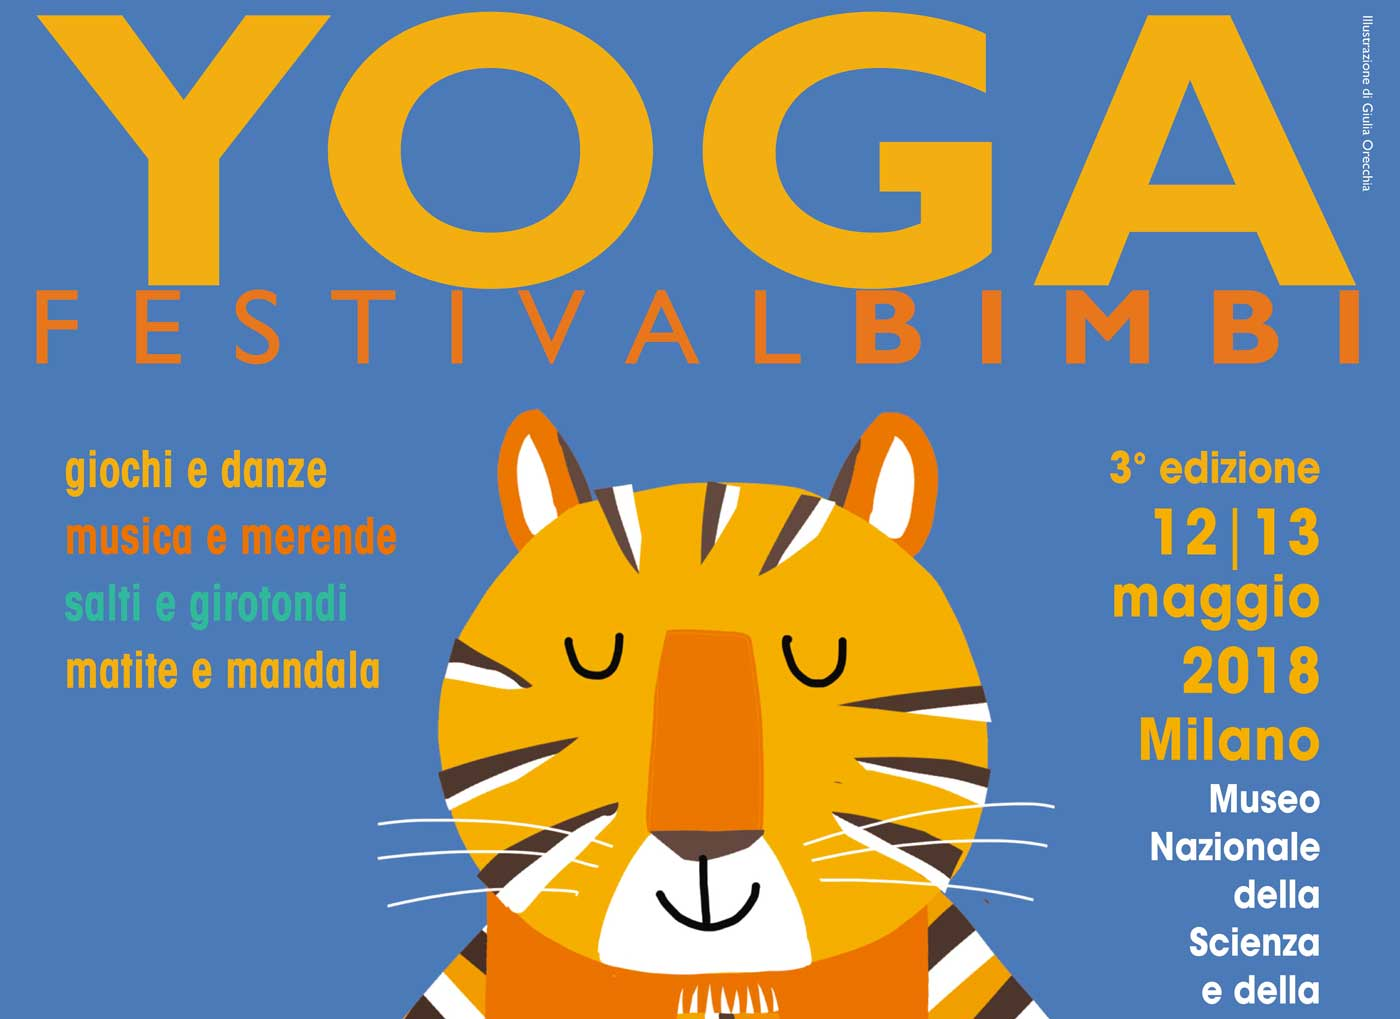 yoga festival bambini carla nataloni